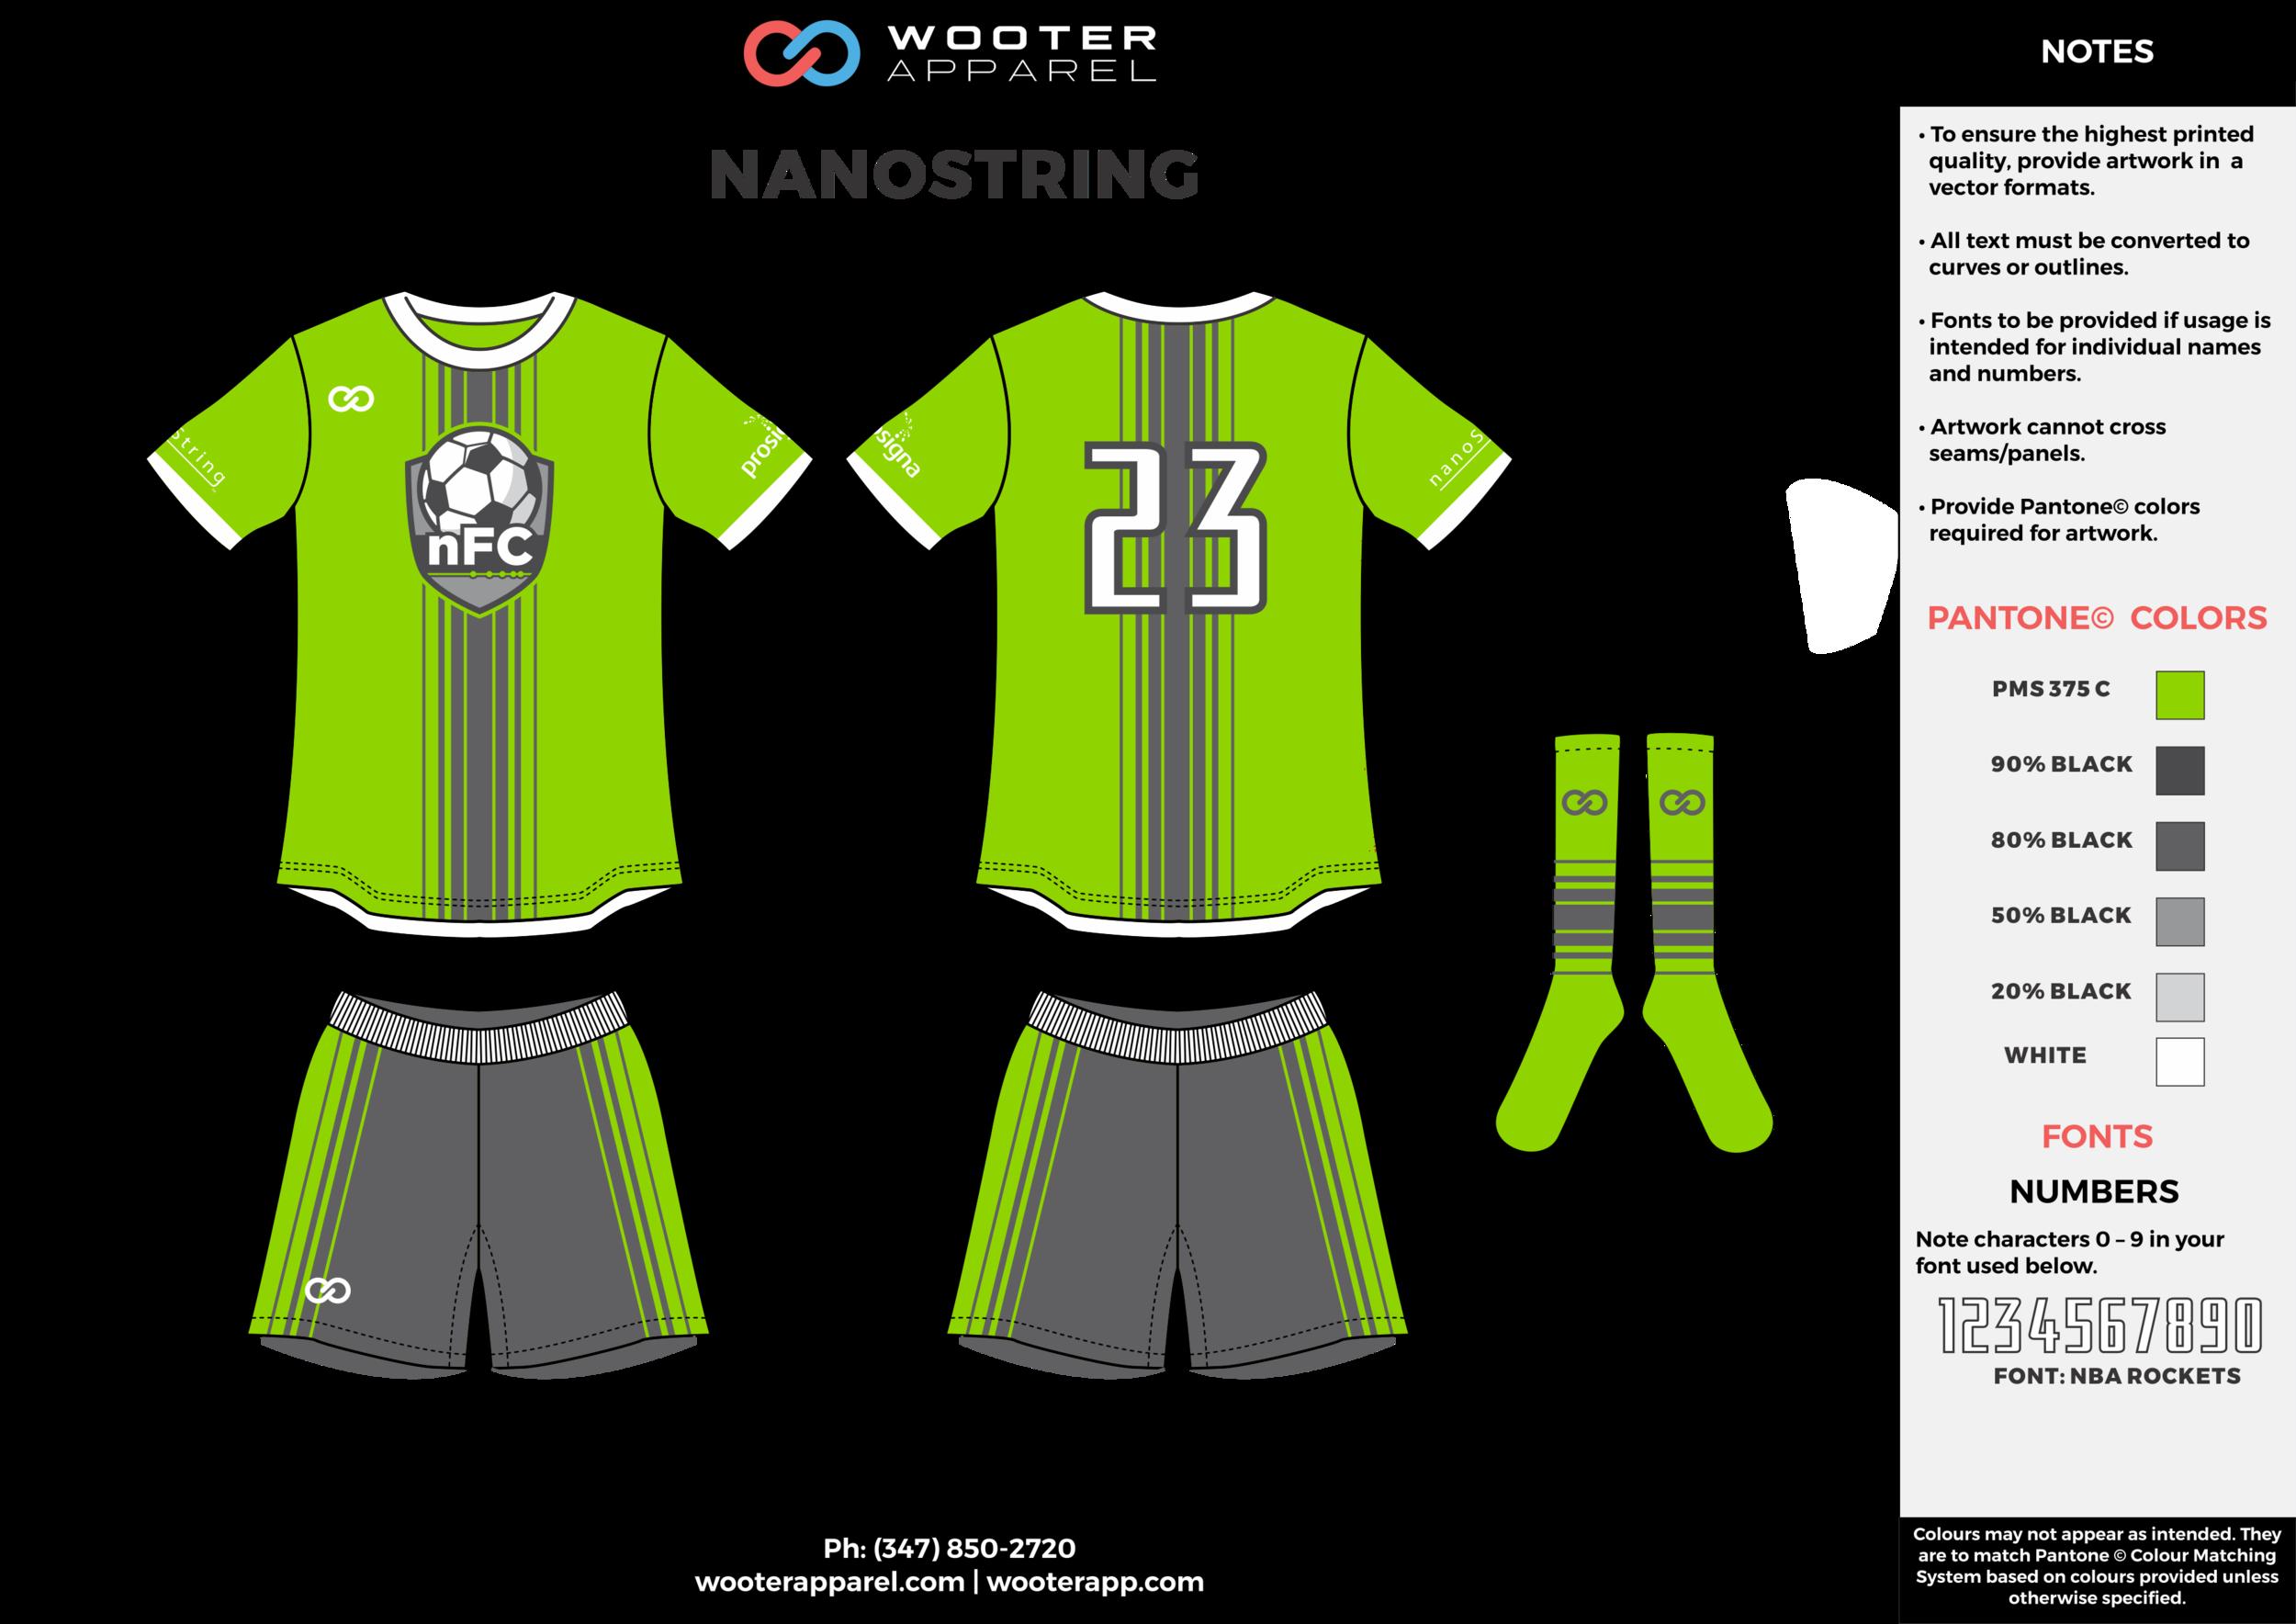 NANOSTRING green gray white custom sublimated soccer uniform jersey shirt shorts socks